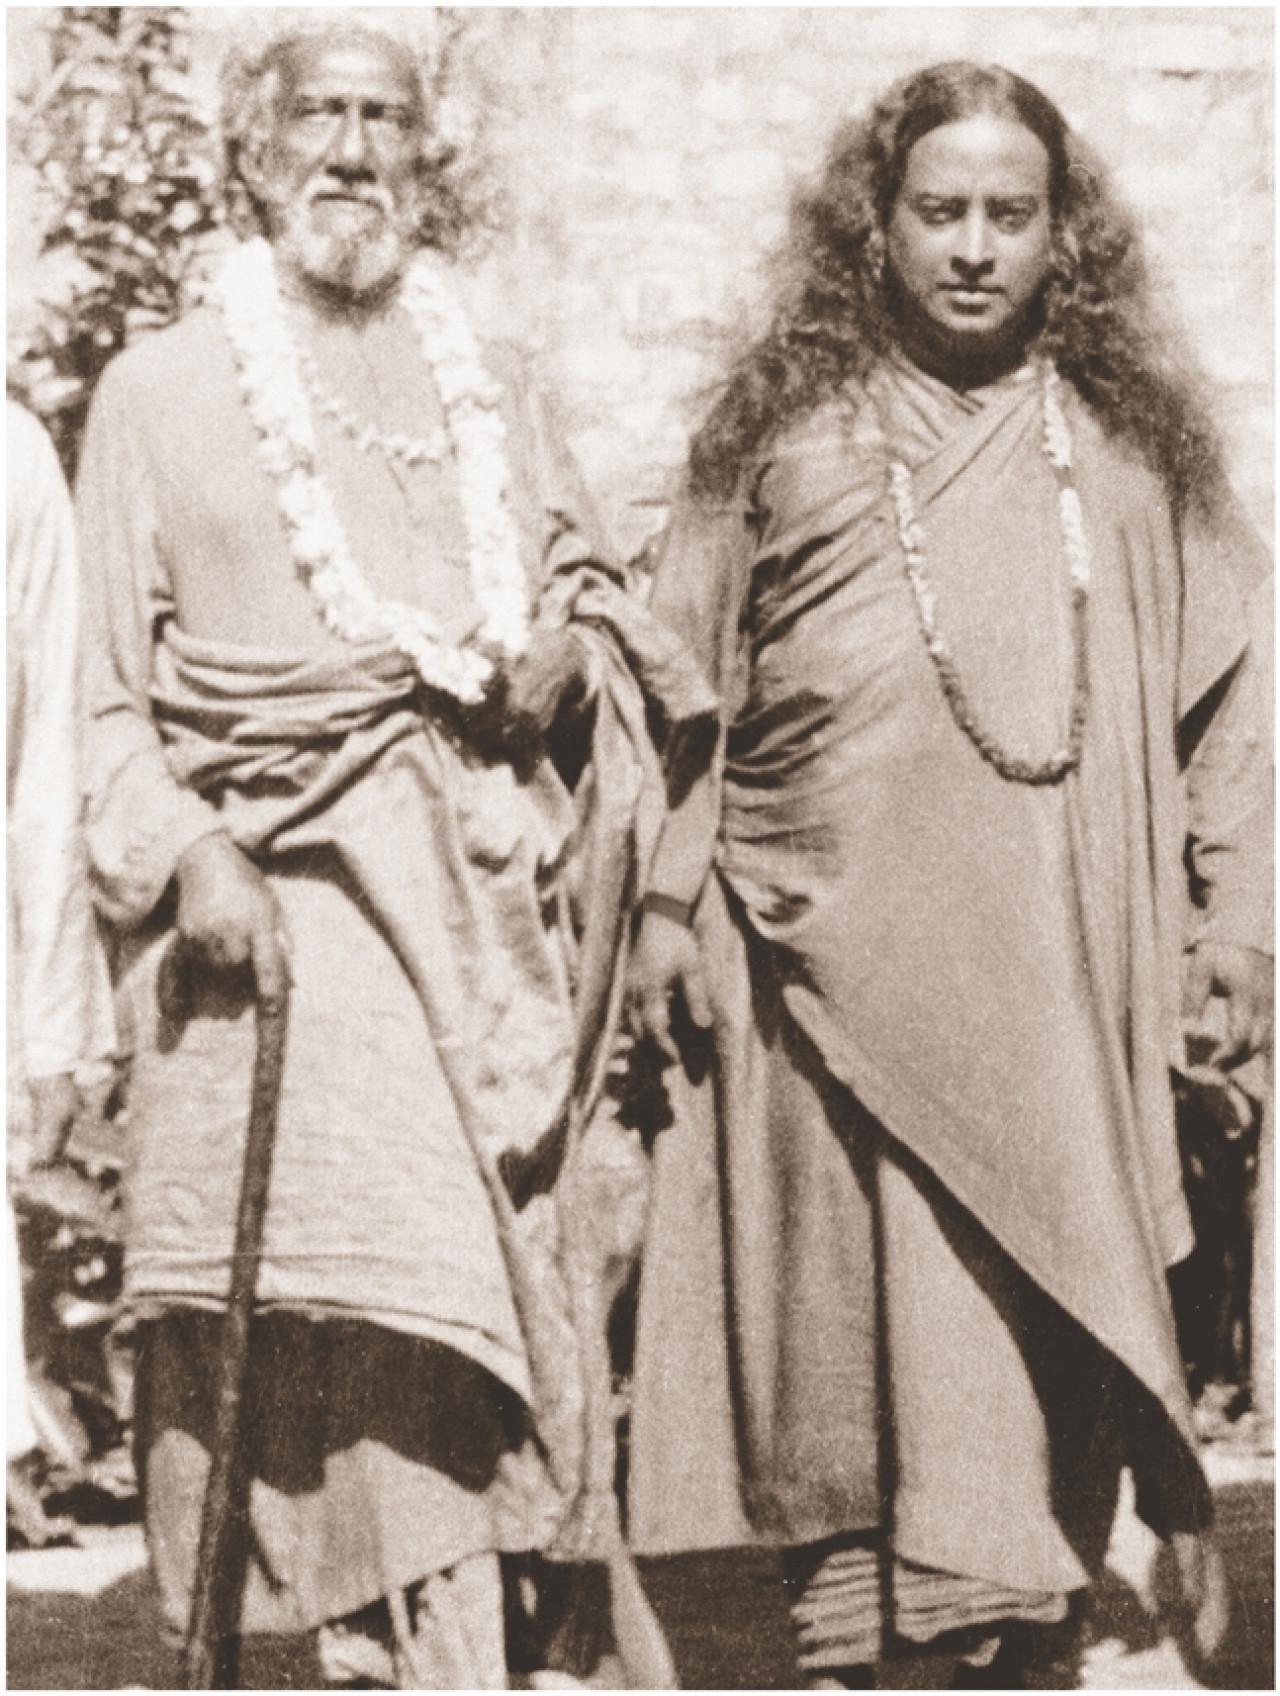 Yogananda And Sri Yukteswar 1935 Py 3505 C 18 034 E